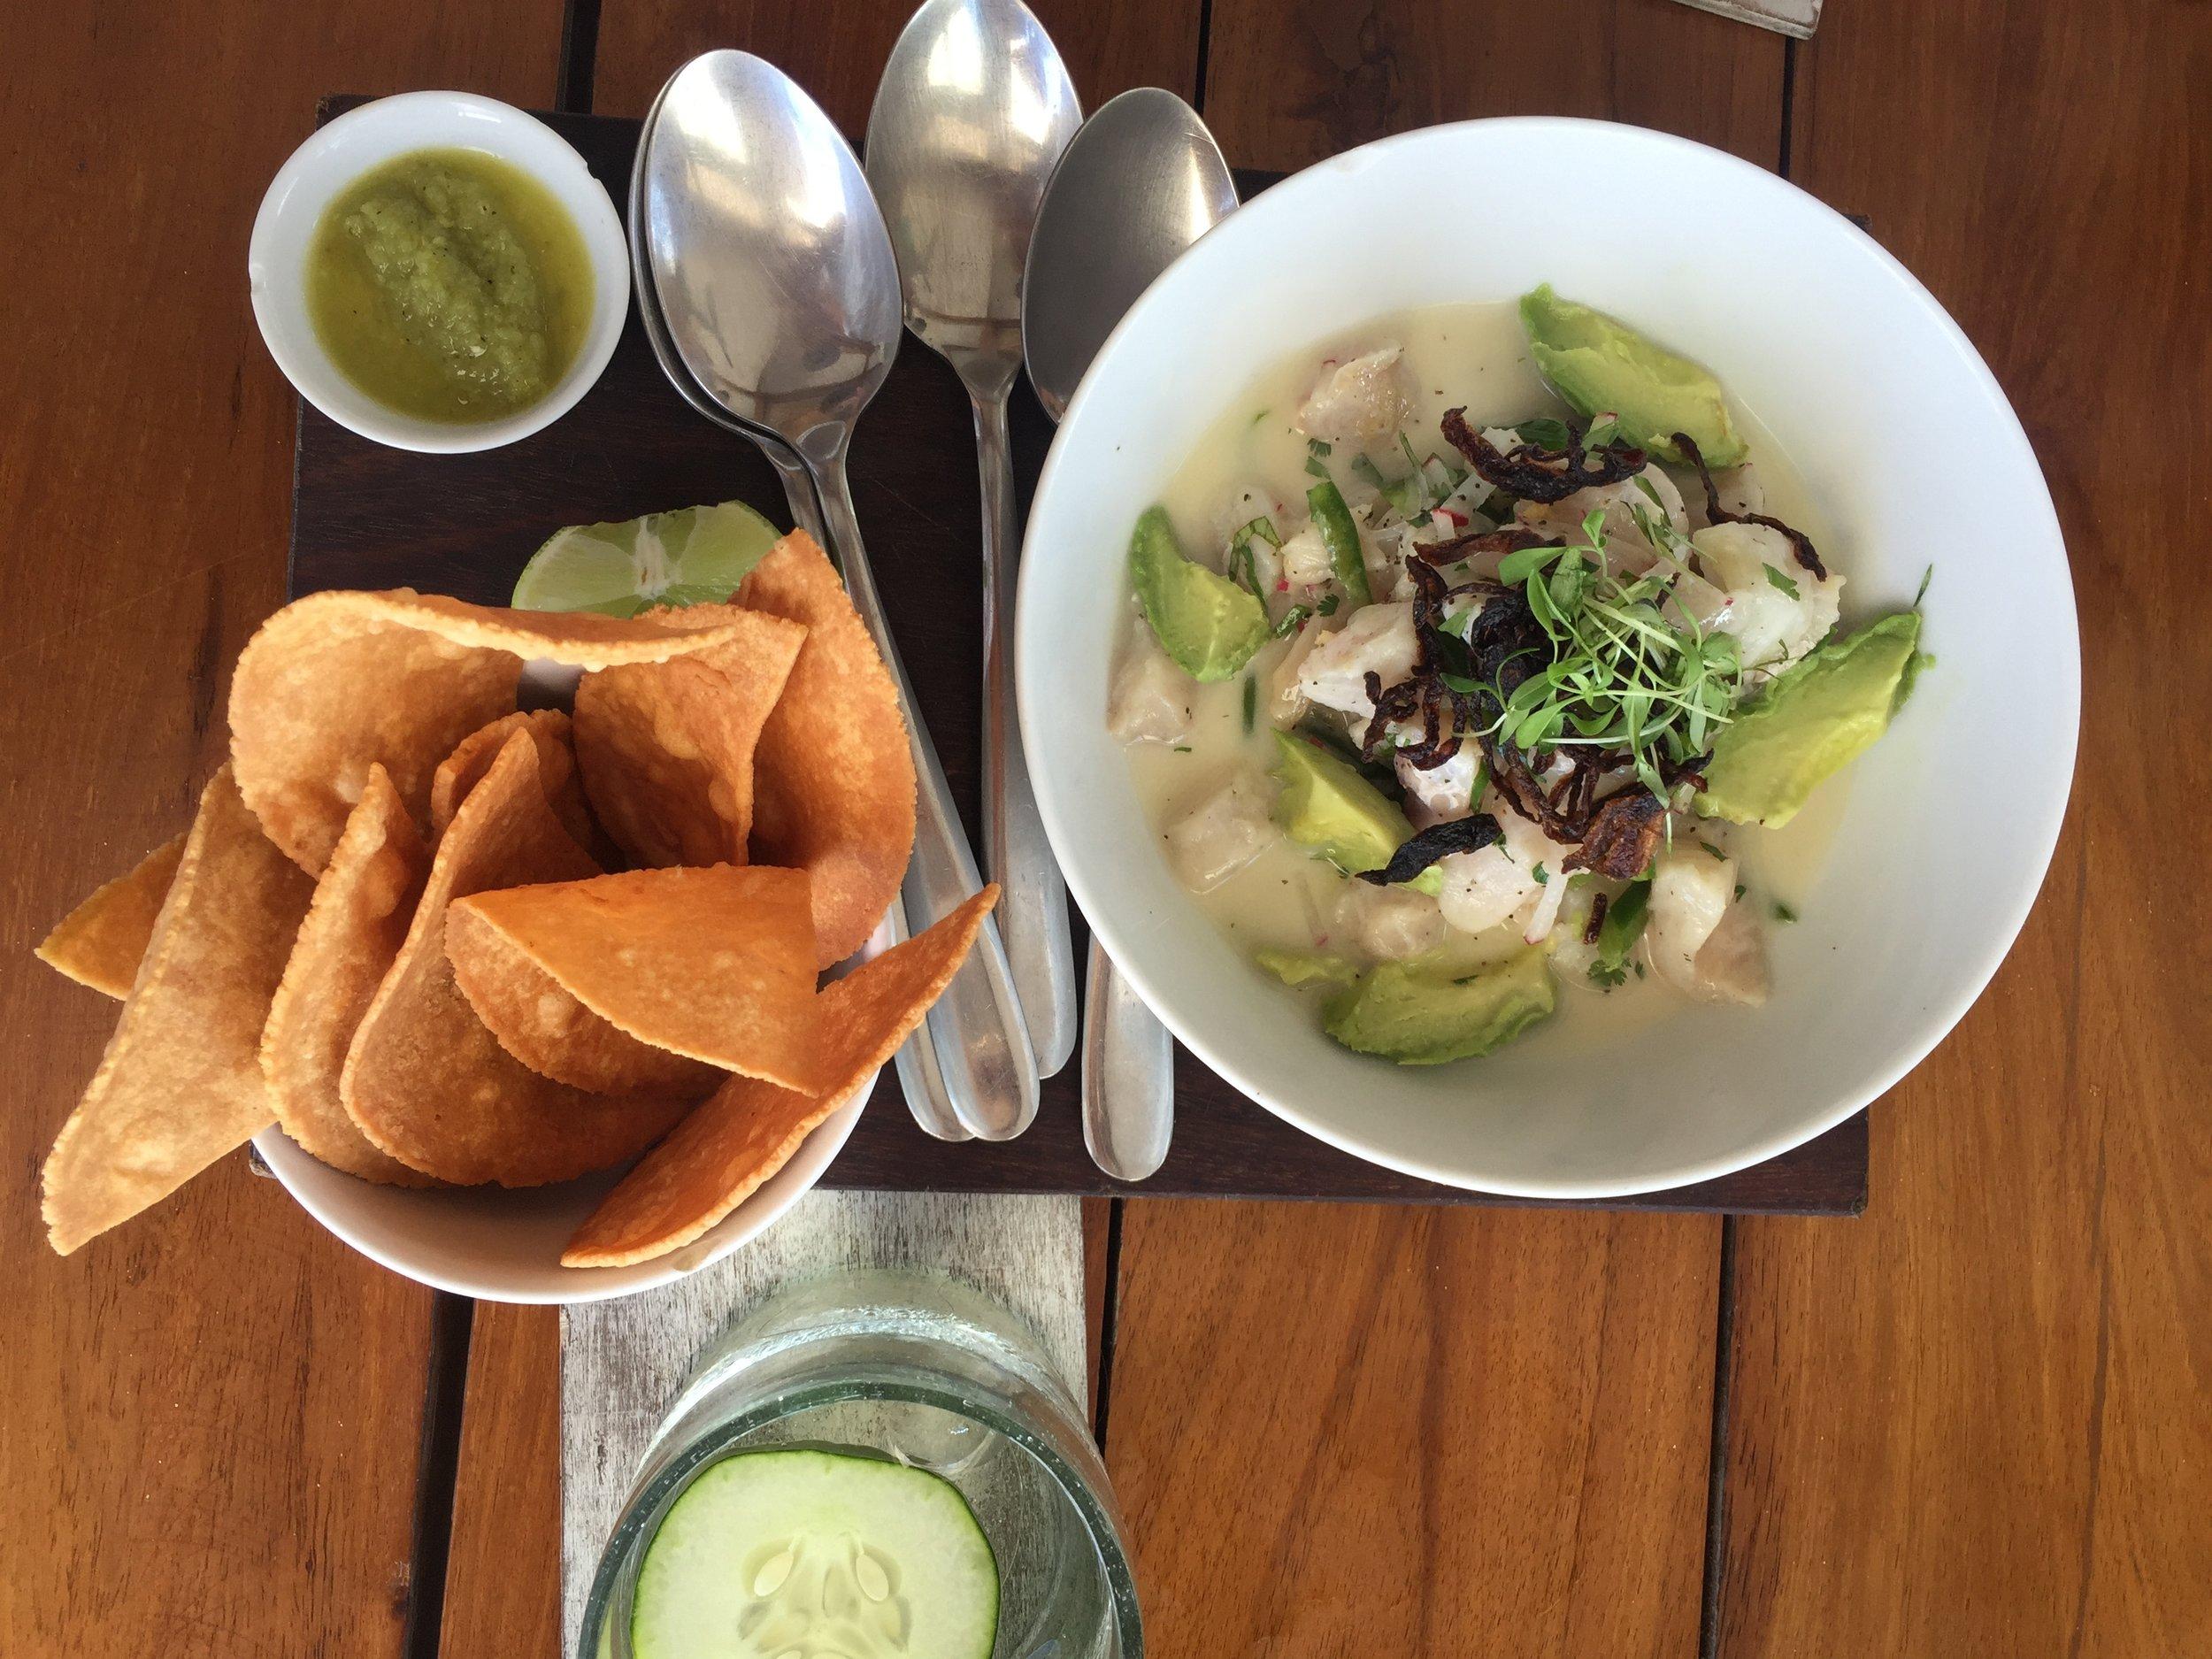 Lunch at the Real Coconut Restaurant, Hotel Sanara Tulum